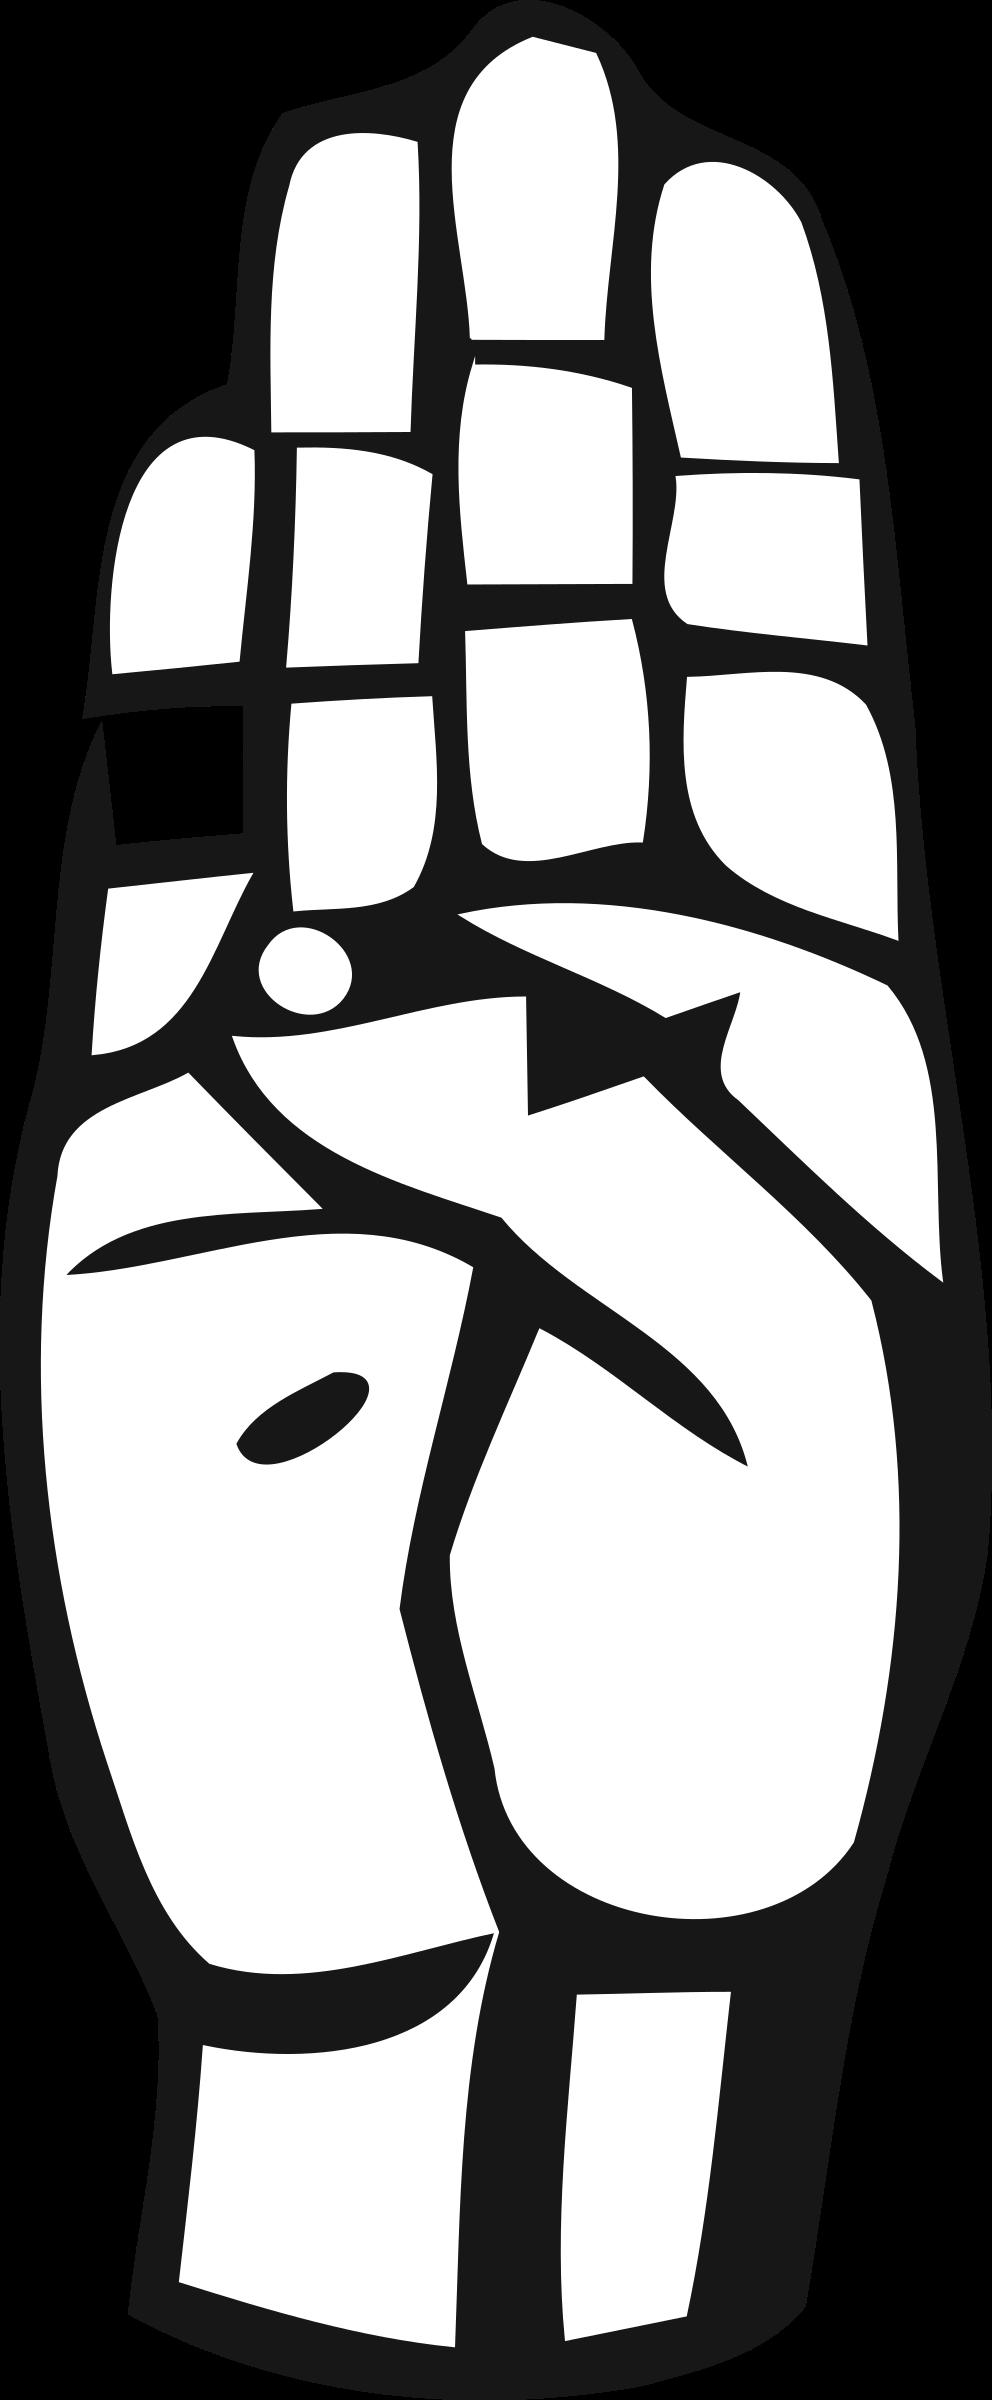 Clipart sign language alphabet clip freeuse download Clipart - Deaf Alphabet B clip freeuse download